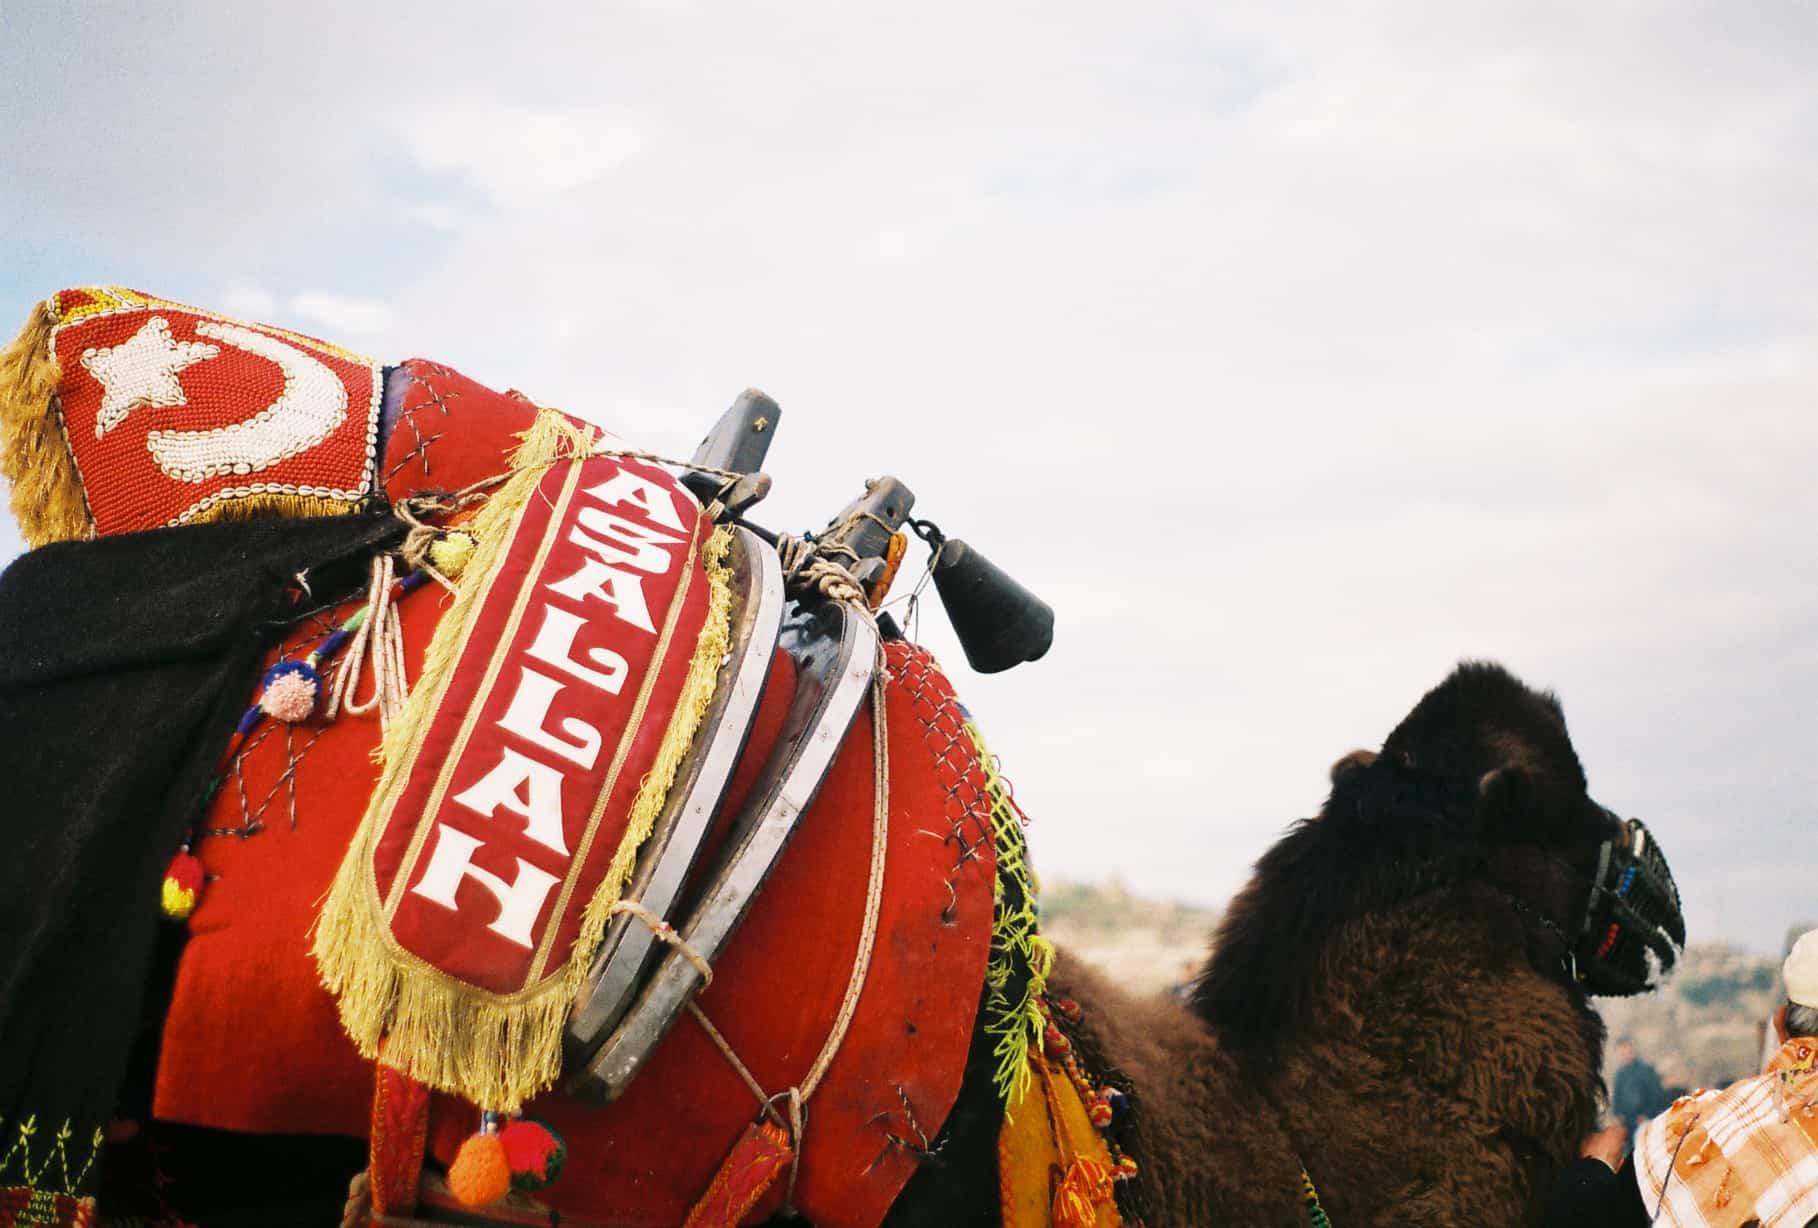 Mashallah Camel (camel wrestling festival)